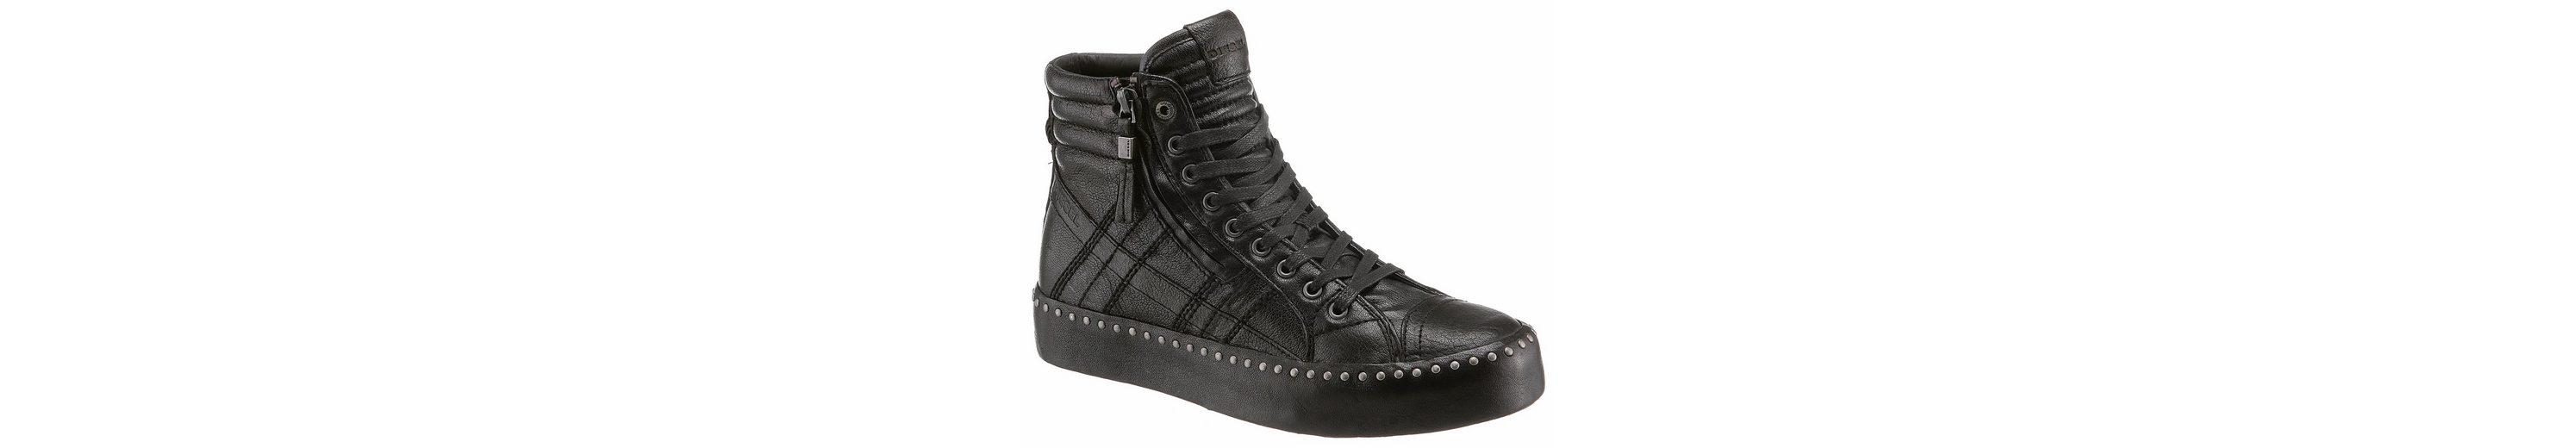 Diesel D-Strings Plus Wedge W Sneaker, mit coolem Zierrei脽verschluss au脽en